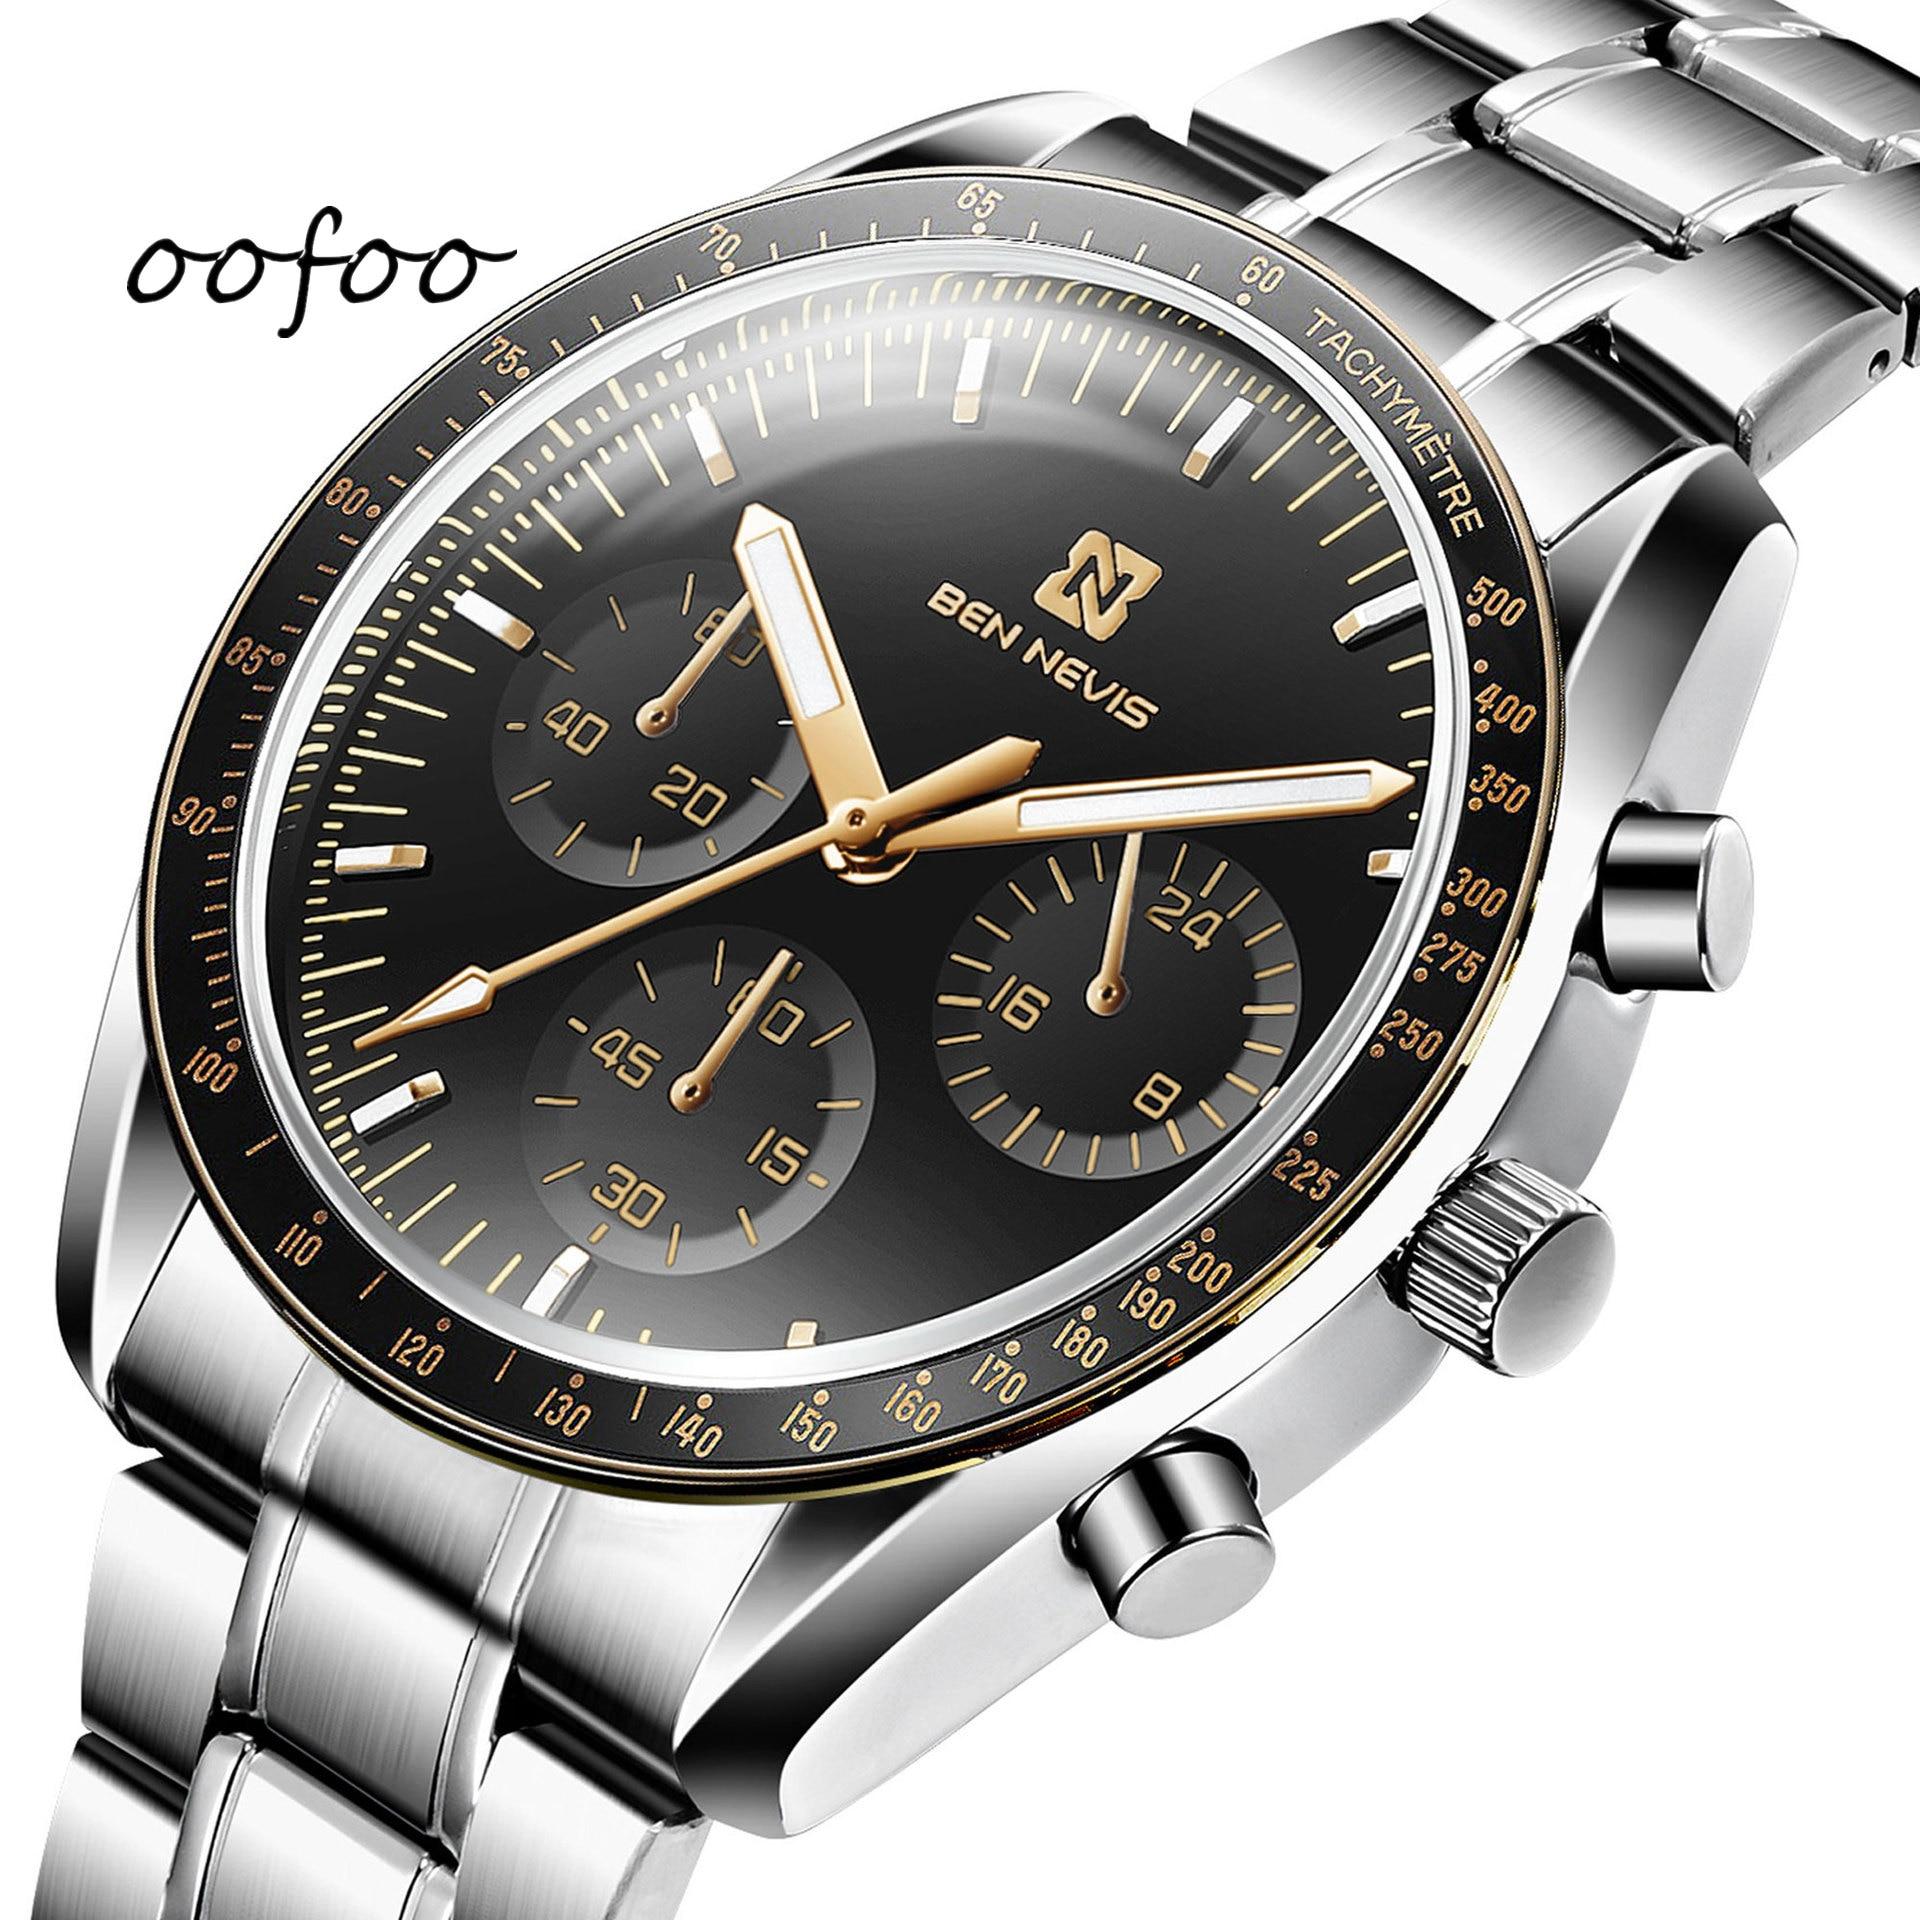 2021 New Hot Selling Fashion Quartz Couple Watch Business 30 Meters Waterproof Alloy Dark Buckle Str